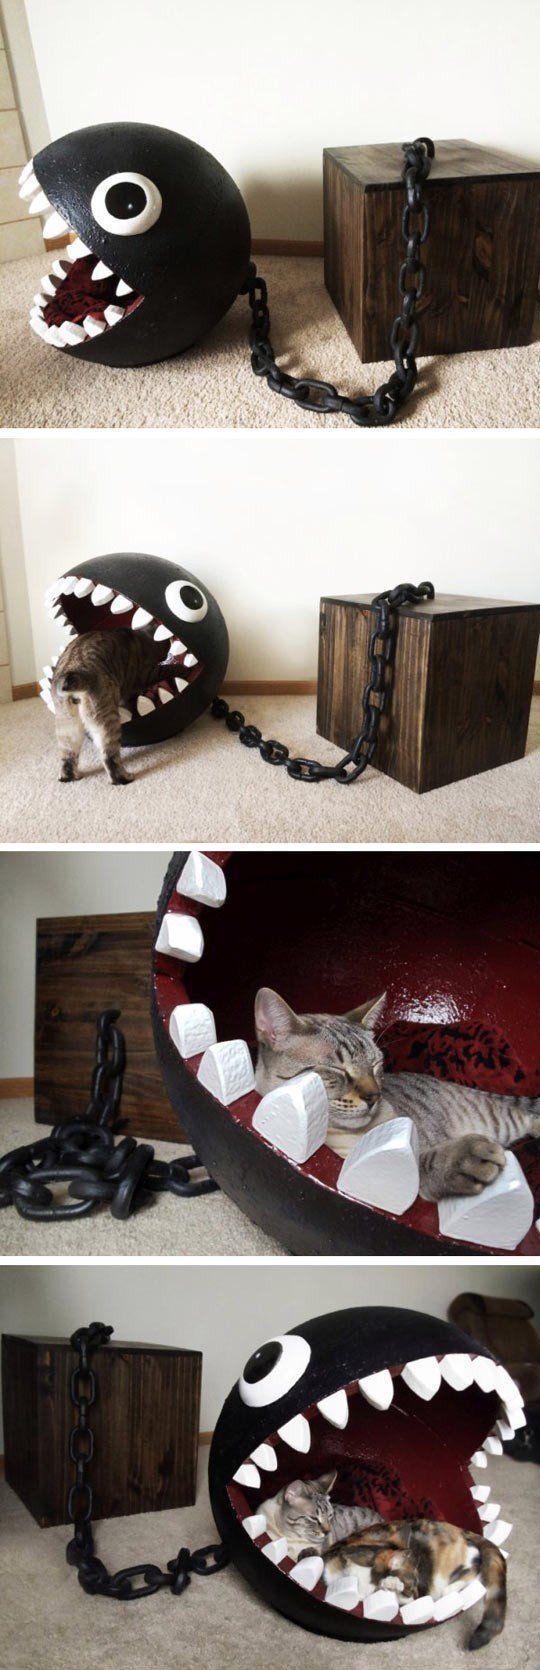 ber ideen zu katzen auf pinterest katzen k tzchen und katzenbabys. Black Bedroom Furniture Sets. Home Design Ideas